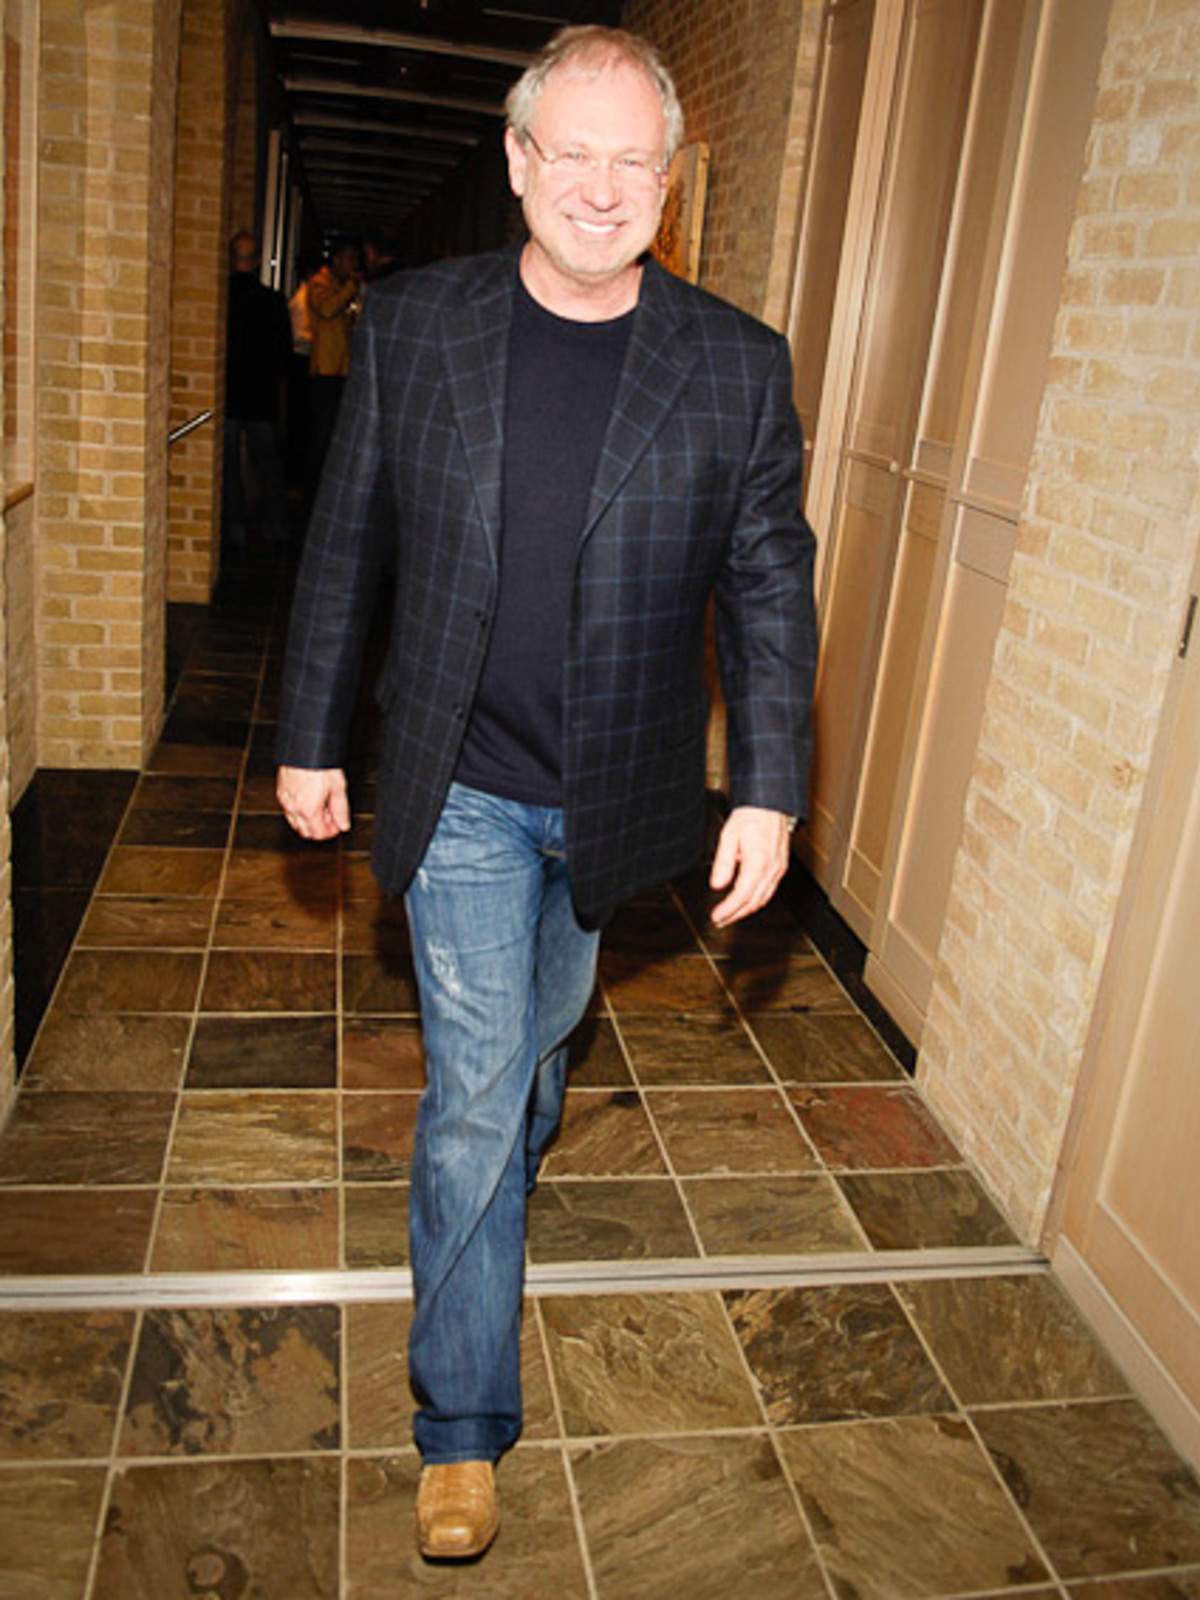 News_Vogue at Becca_Feb. 2010_John Thrash